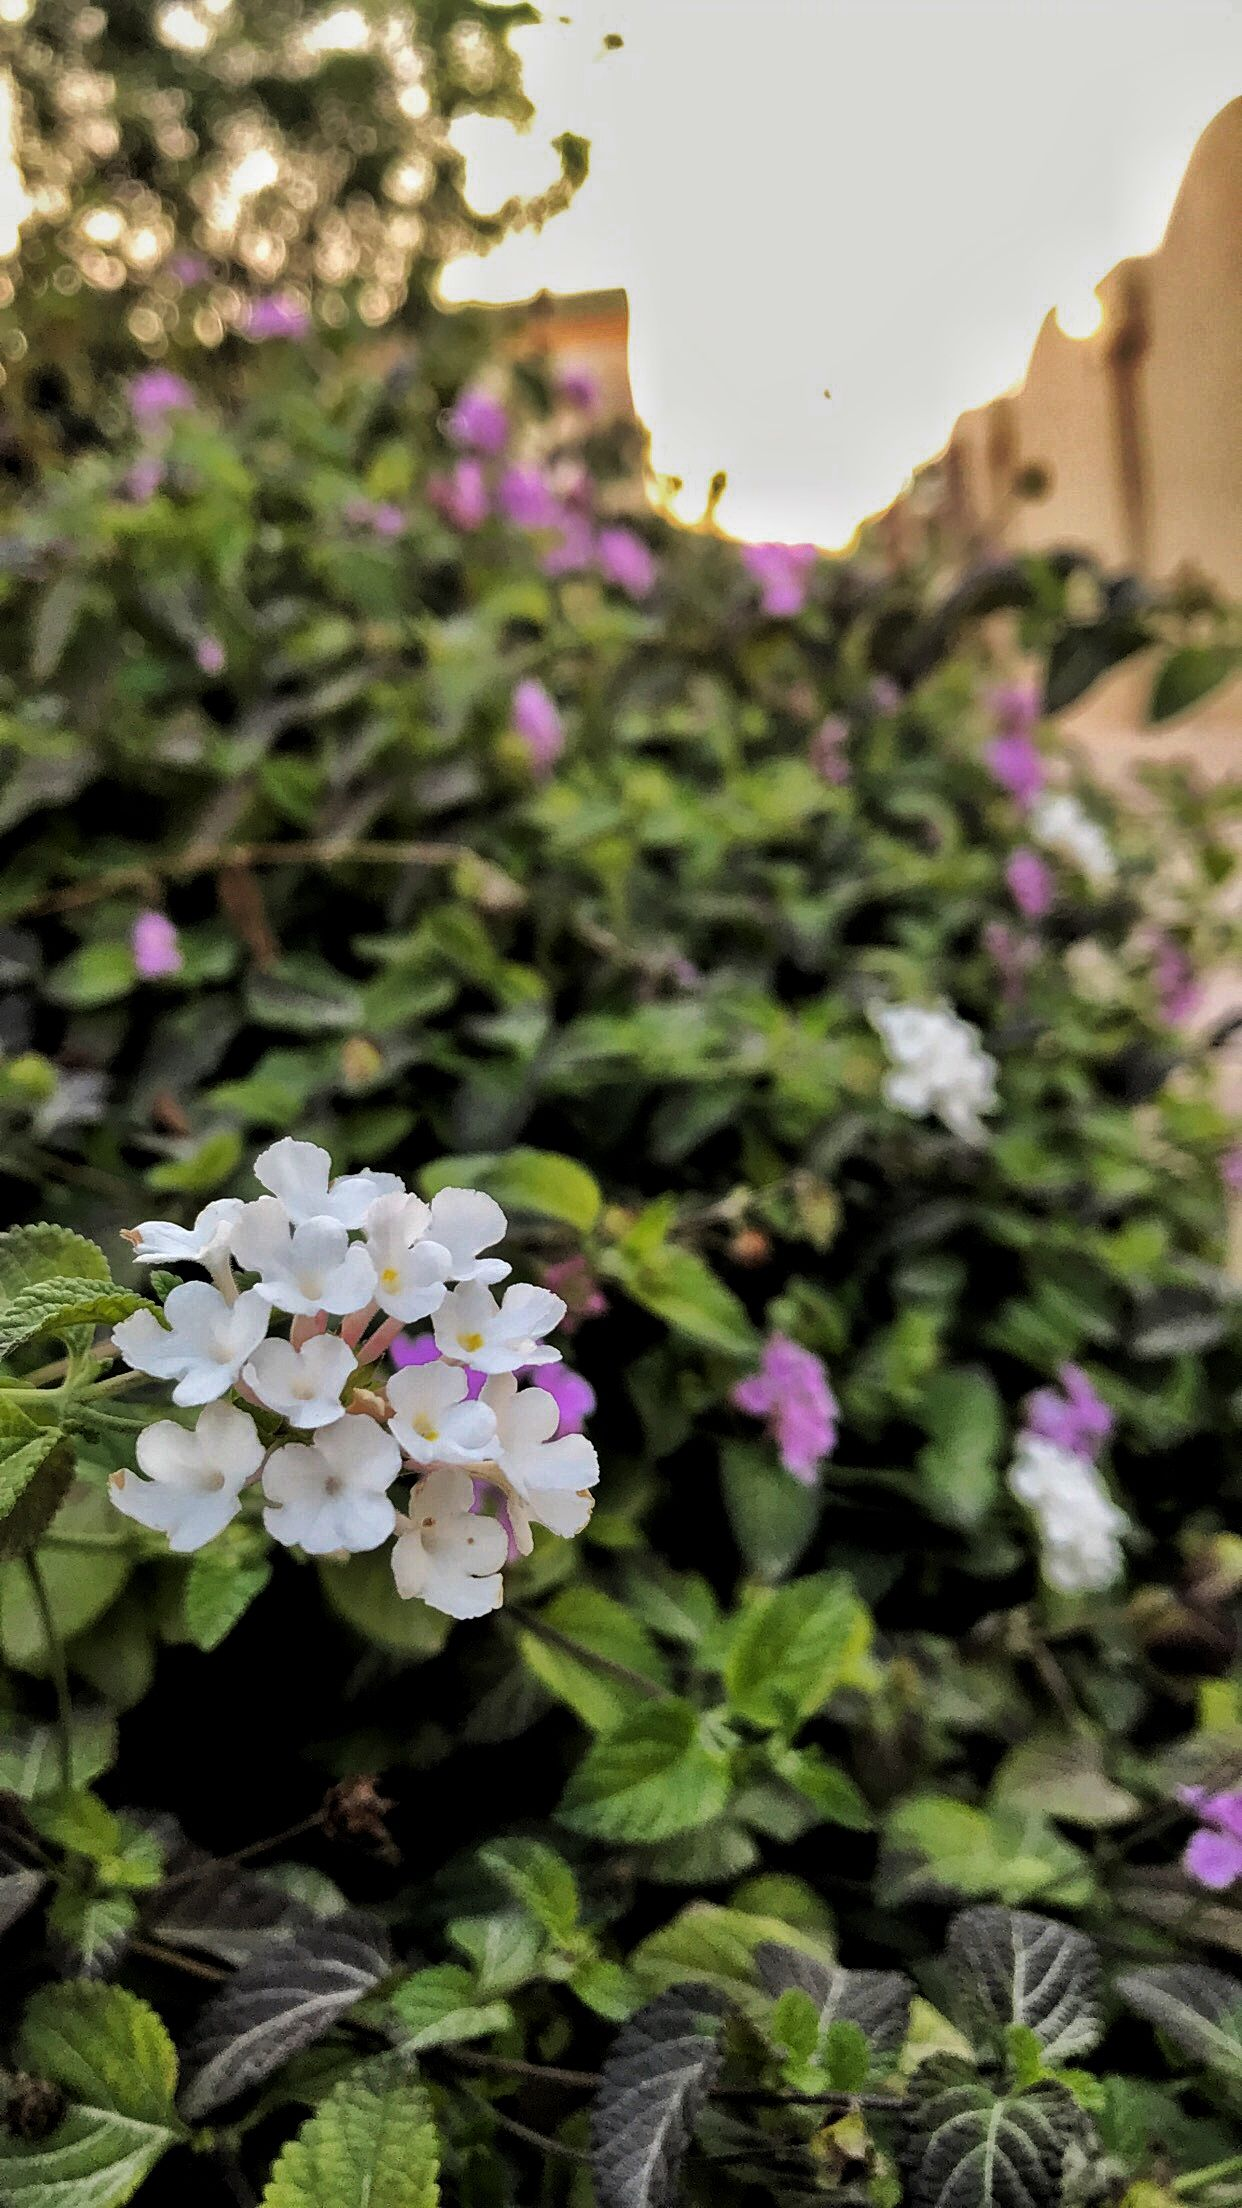 Pin By بثينة الكواري On ورد الربيع Plants Grapes Fruit